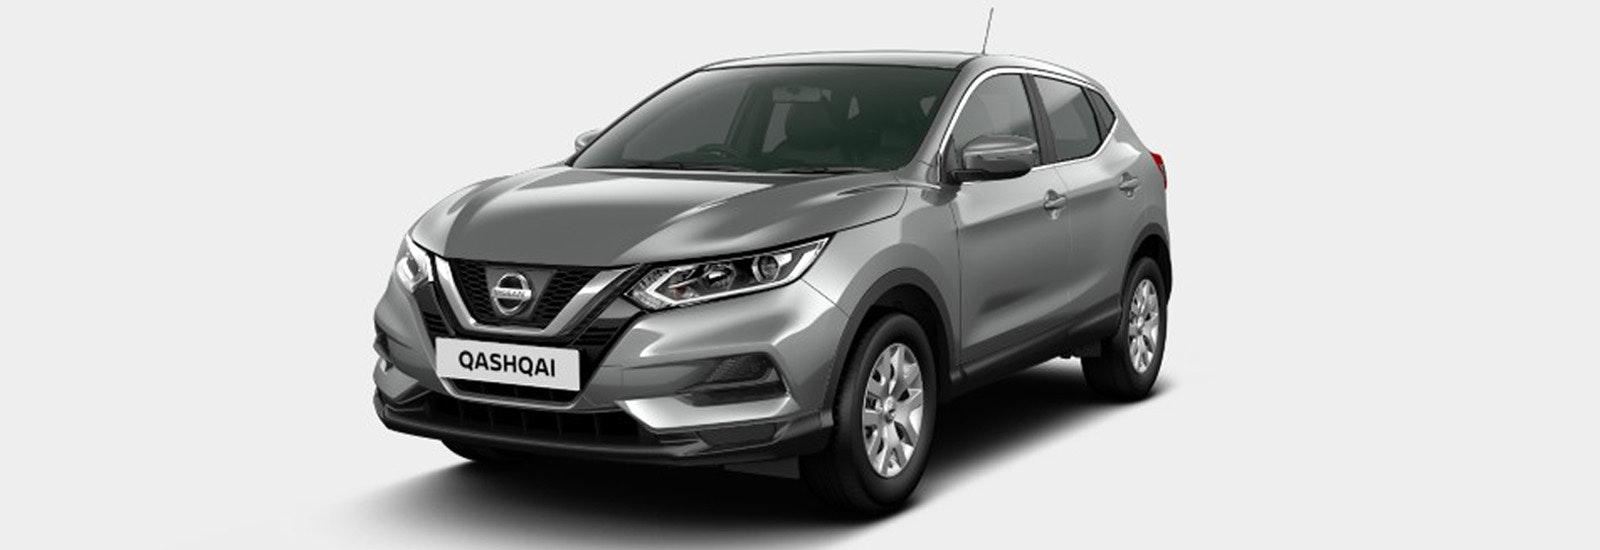 Nissan X Trail 2018 Colours U003eu003e Nissan Qashqai Colours Guide And Prices    Carwow